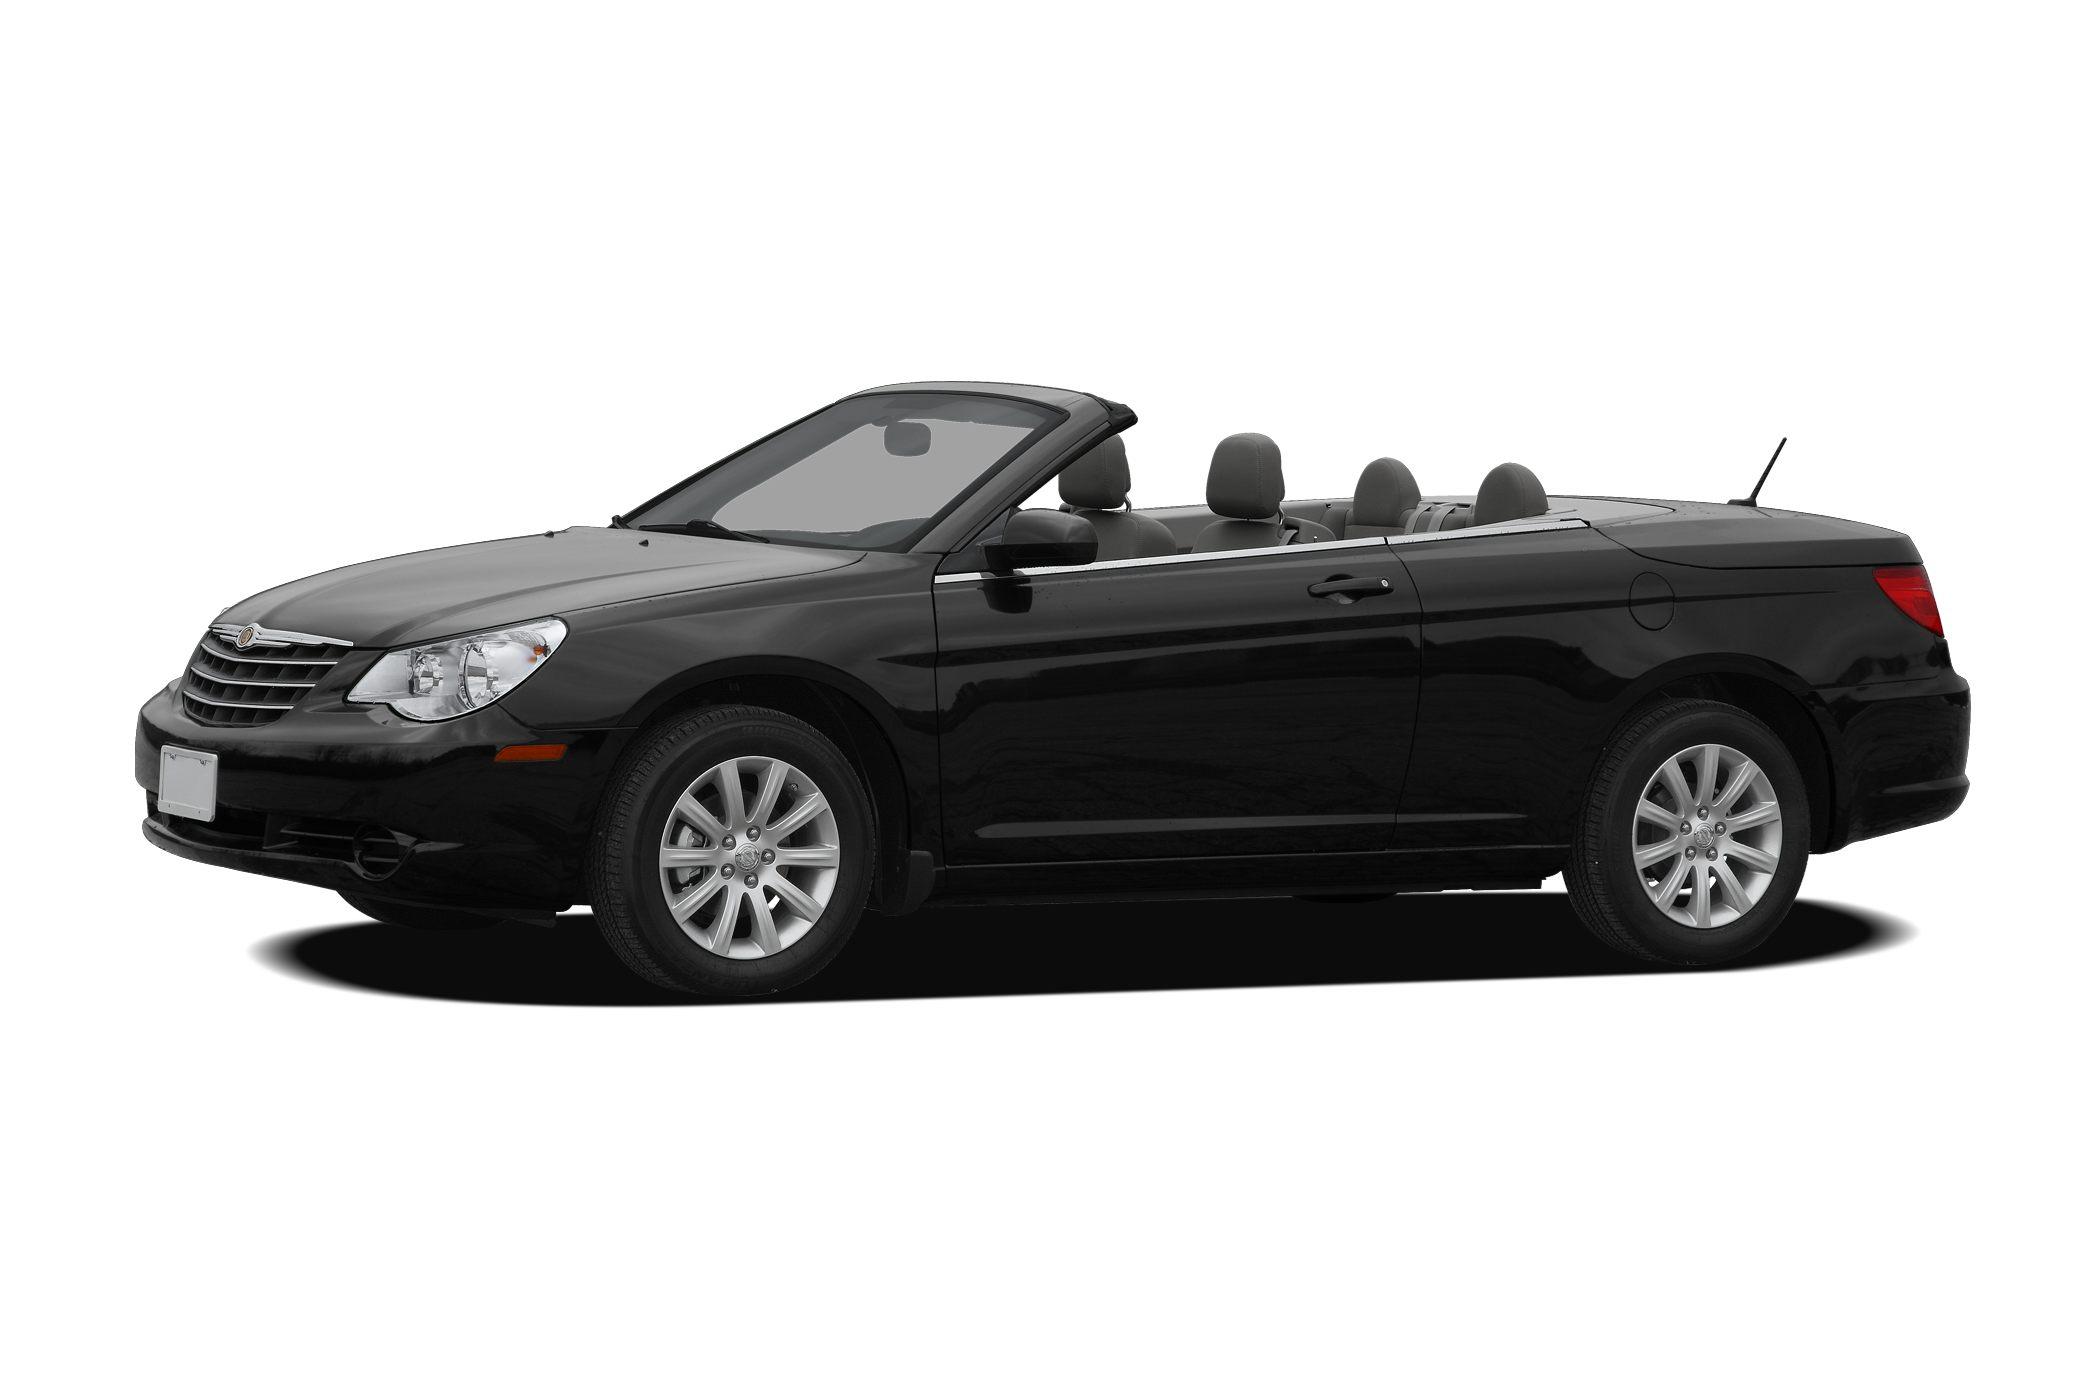 2009 Chrysler Sebring LX Sedan for sale in Chattanooga for $8,291 with 88,739 miles